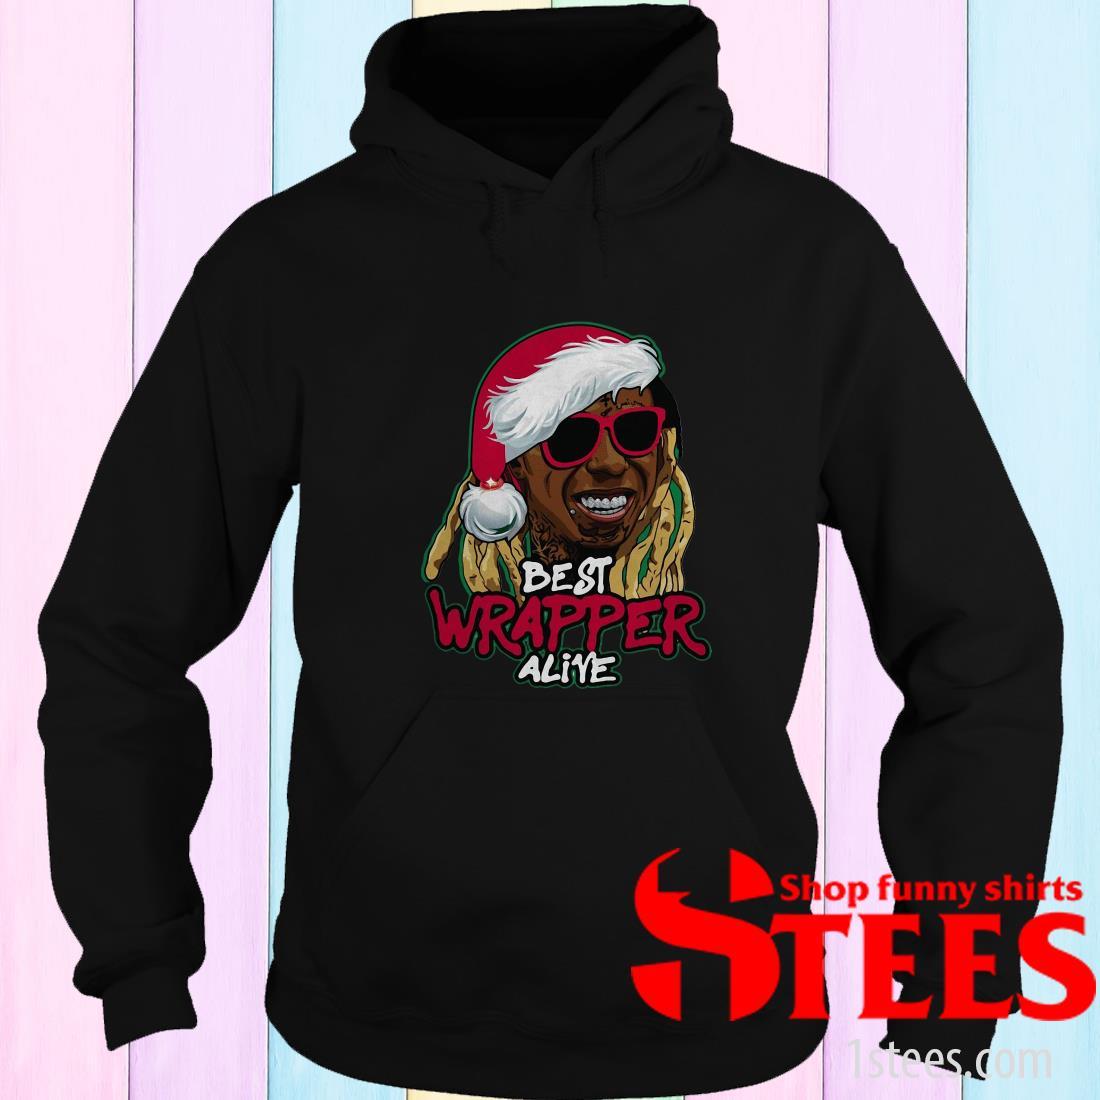 Best Wrapper Alive Christmas Sweatshirt